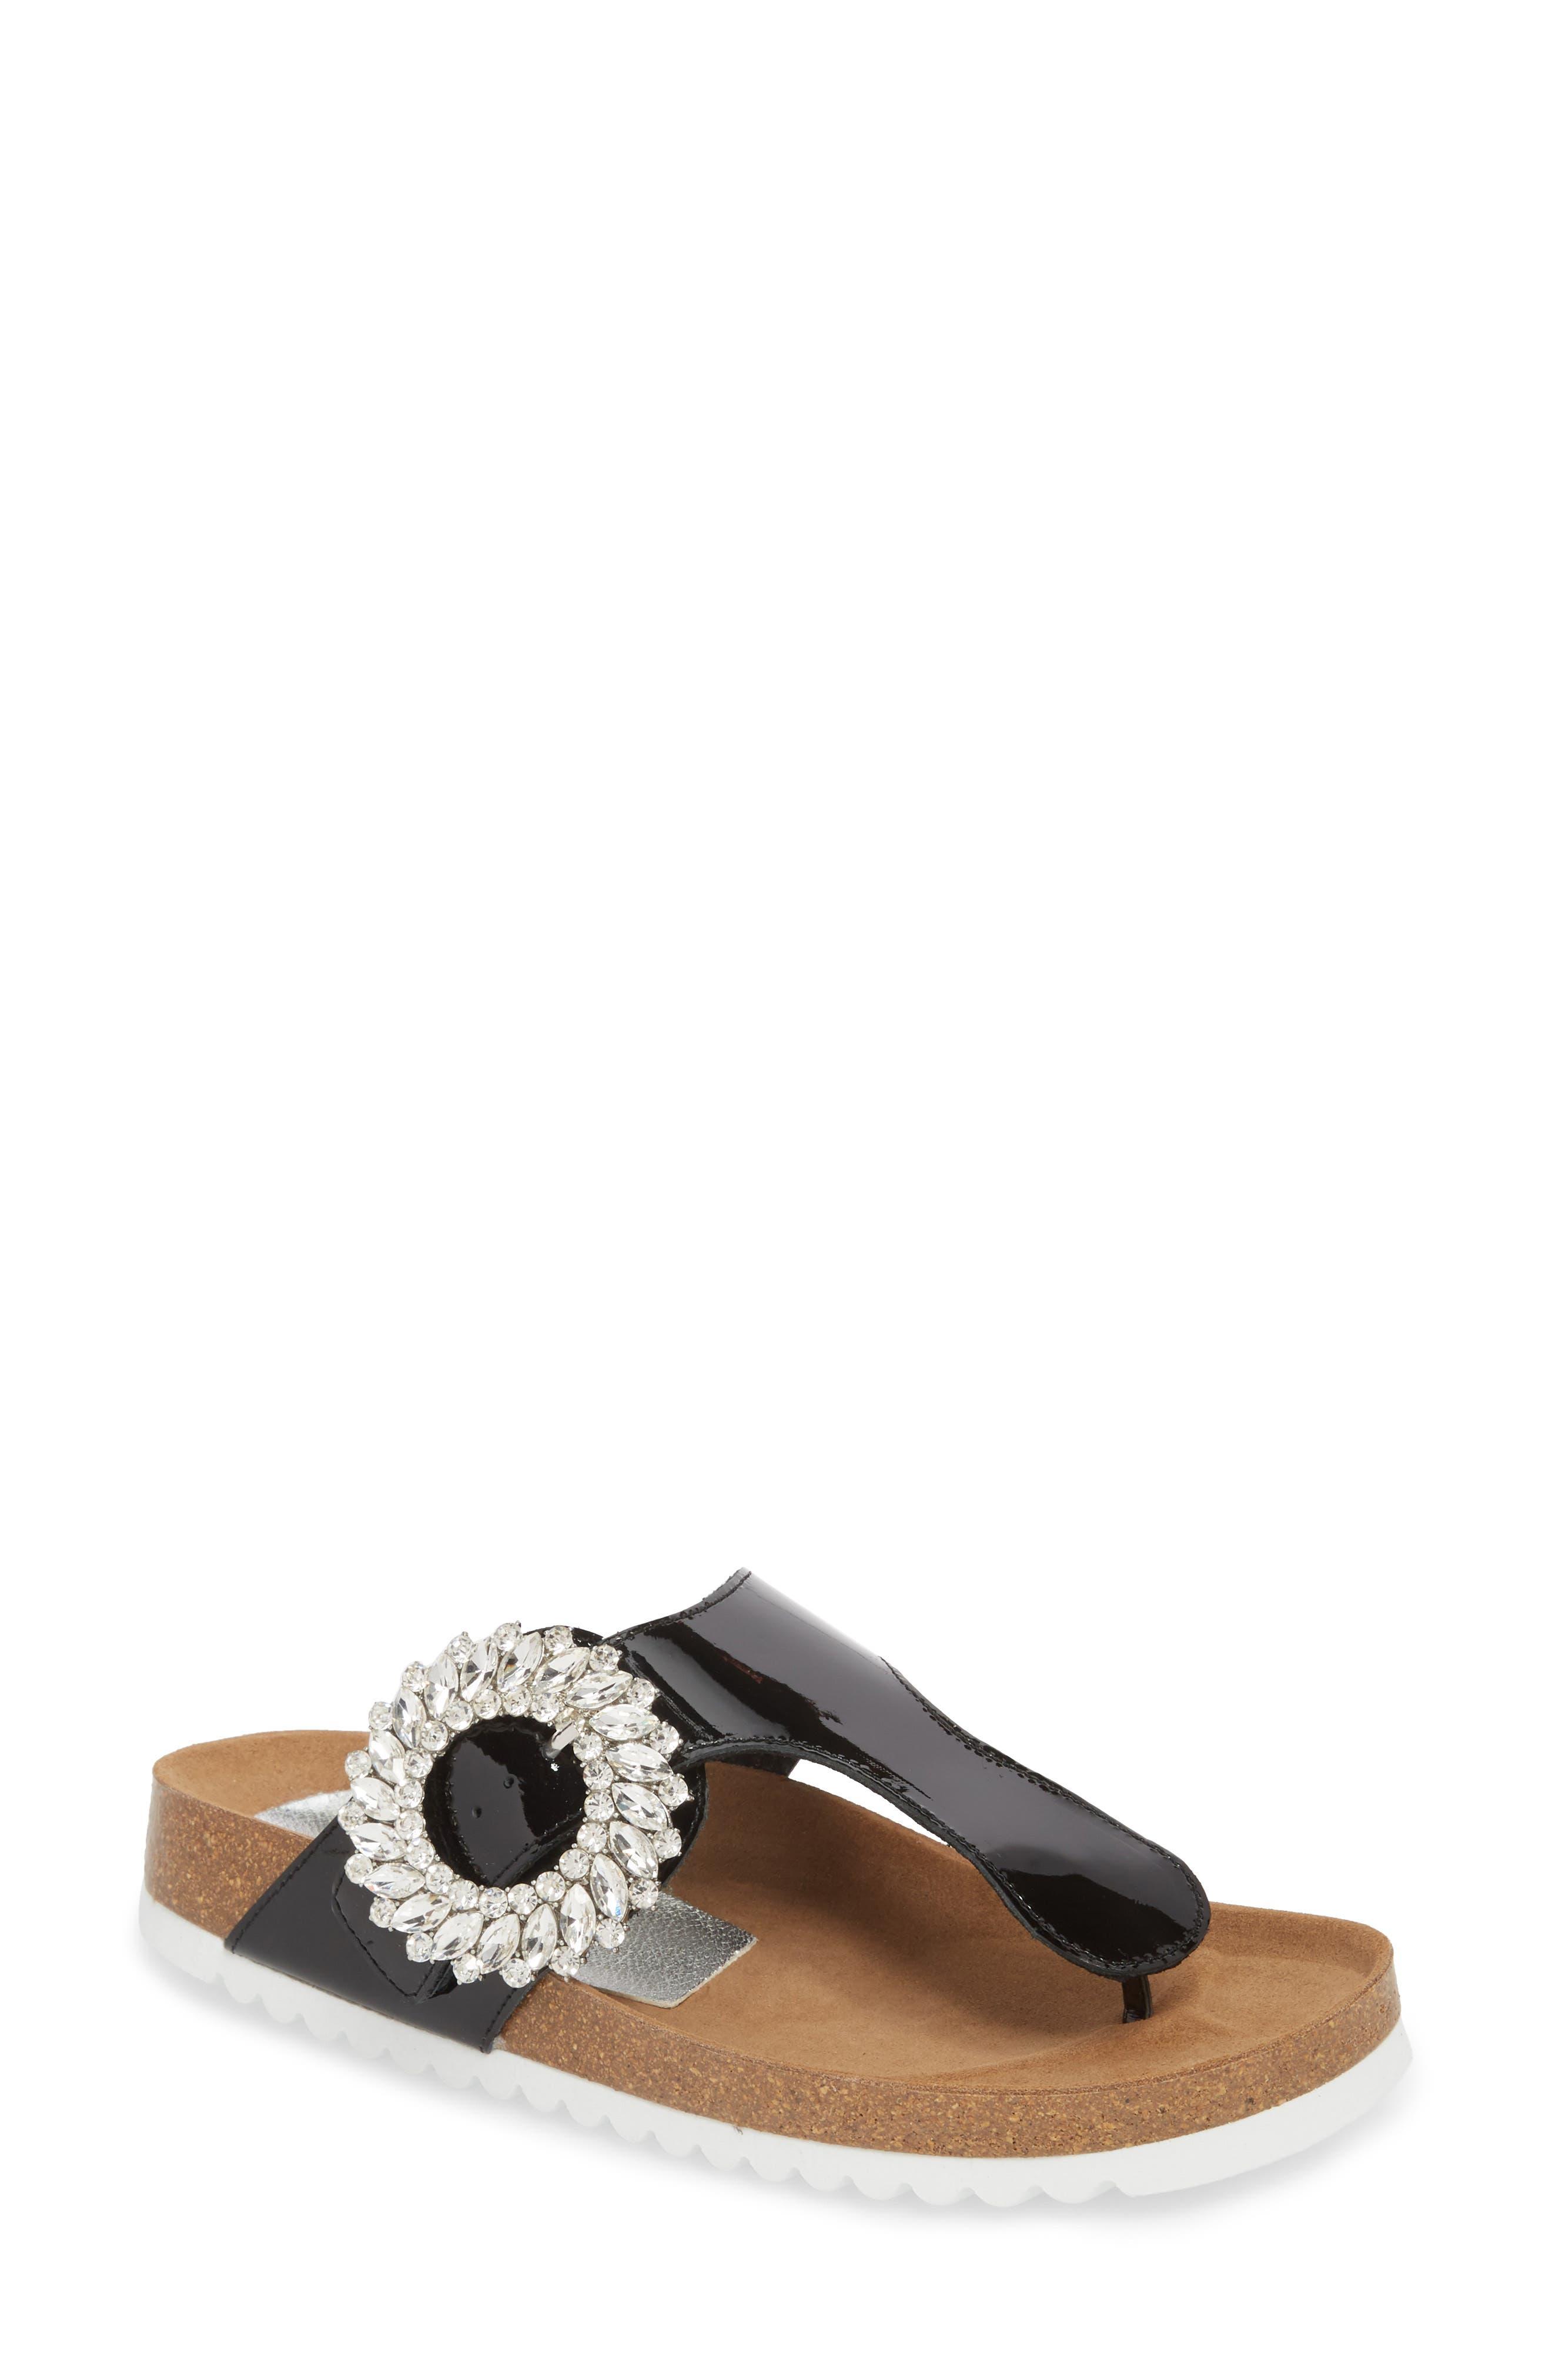 Madeira Embellished T-Strap Sandal,                             Main thumbnail 1, color,                             Black Patent/ Black Silver